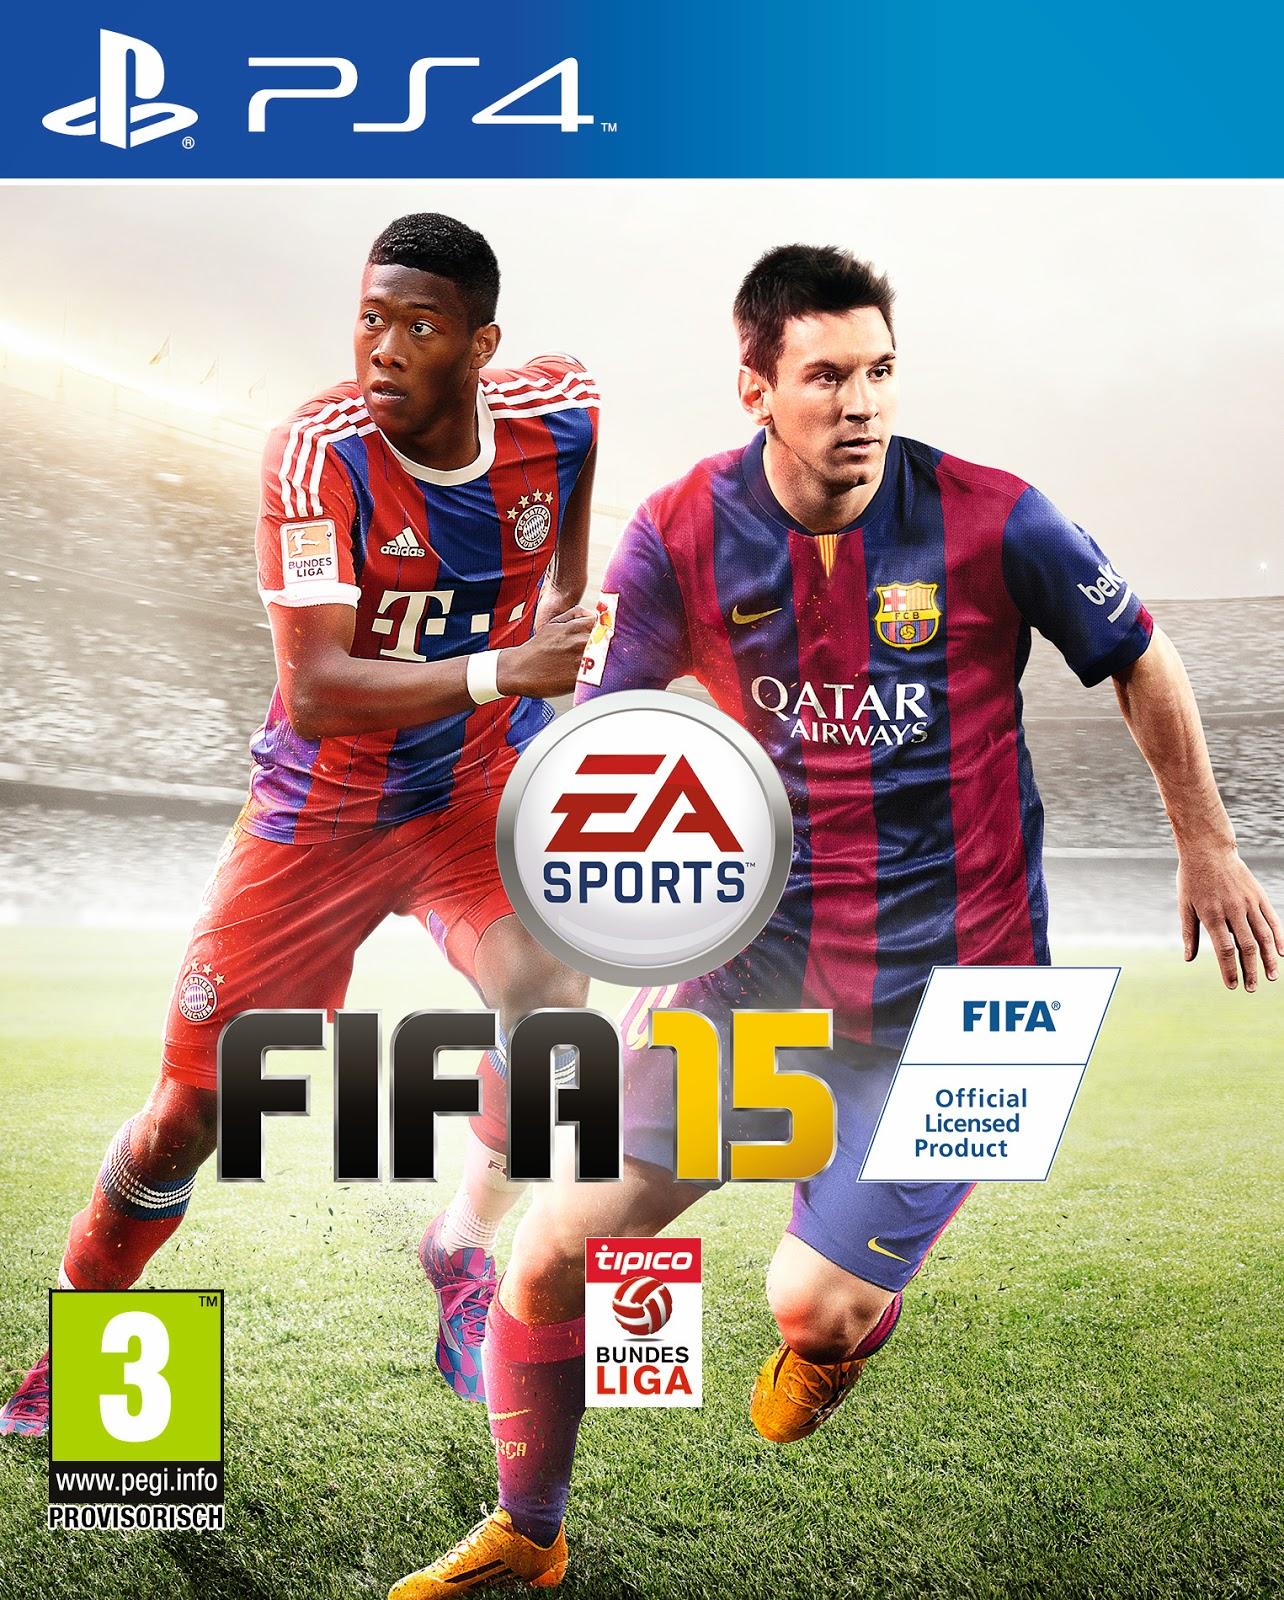 http://www.amazon.de/FIFA-15-Standard-PlayStation-4/dp/B00KQKPSCE/ref=sr_1_cc_2?s=aps&ie=UTF8&qid=1420227631&sr=1-2-catcorr&keywords=fifa+15